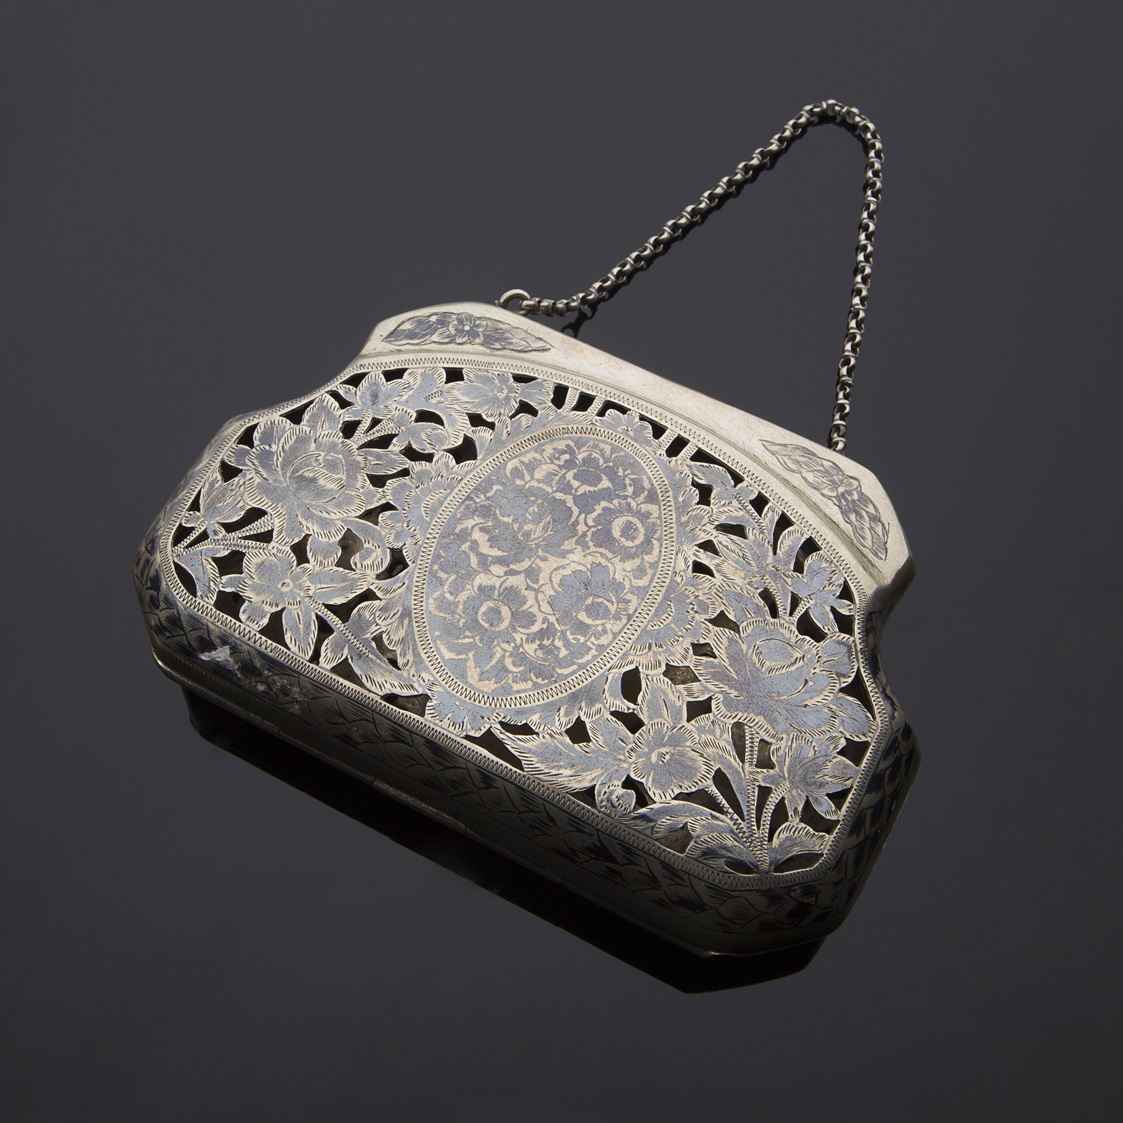 Borsetta in argento